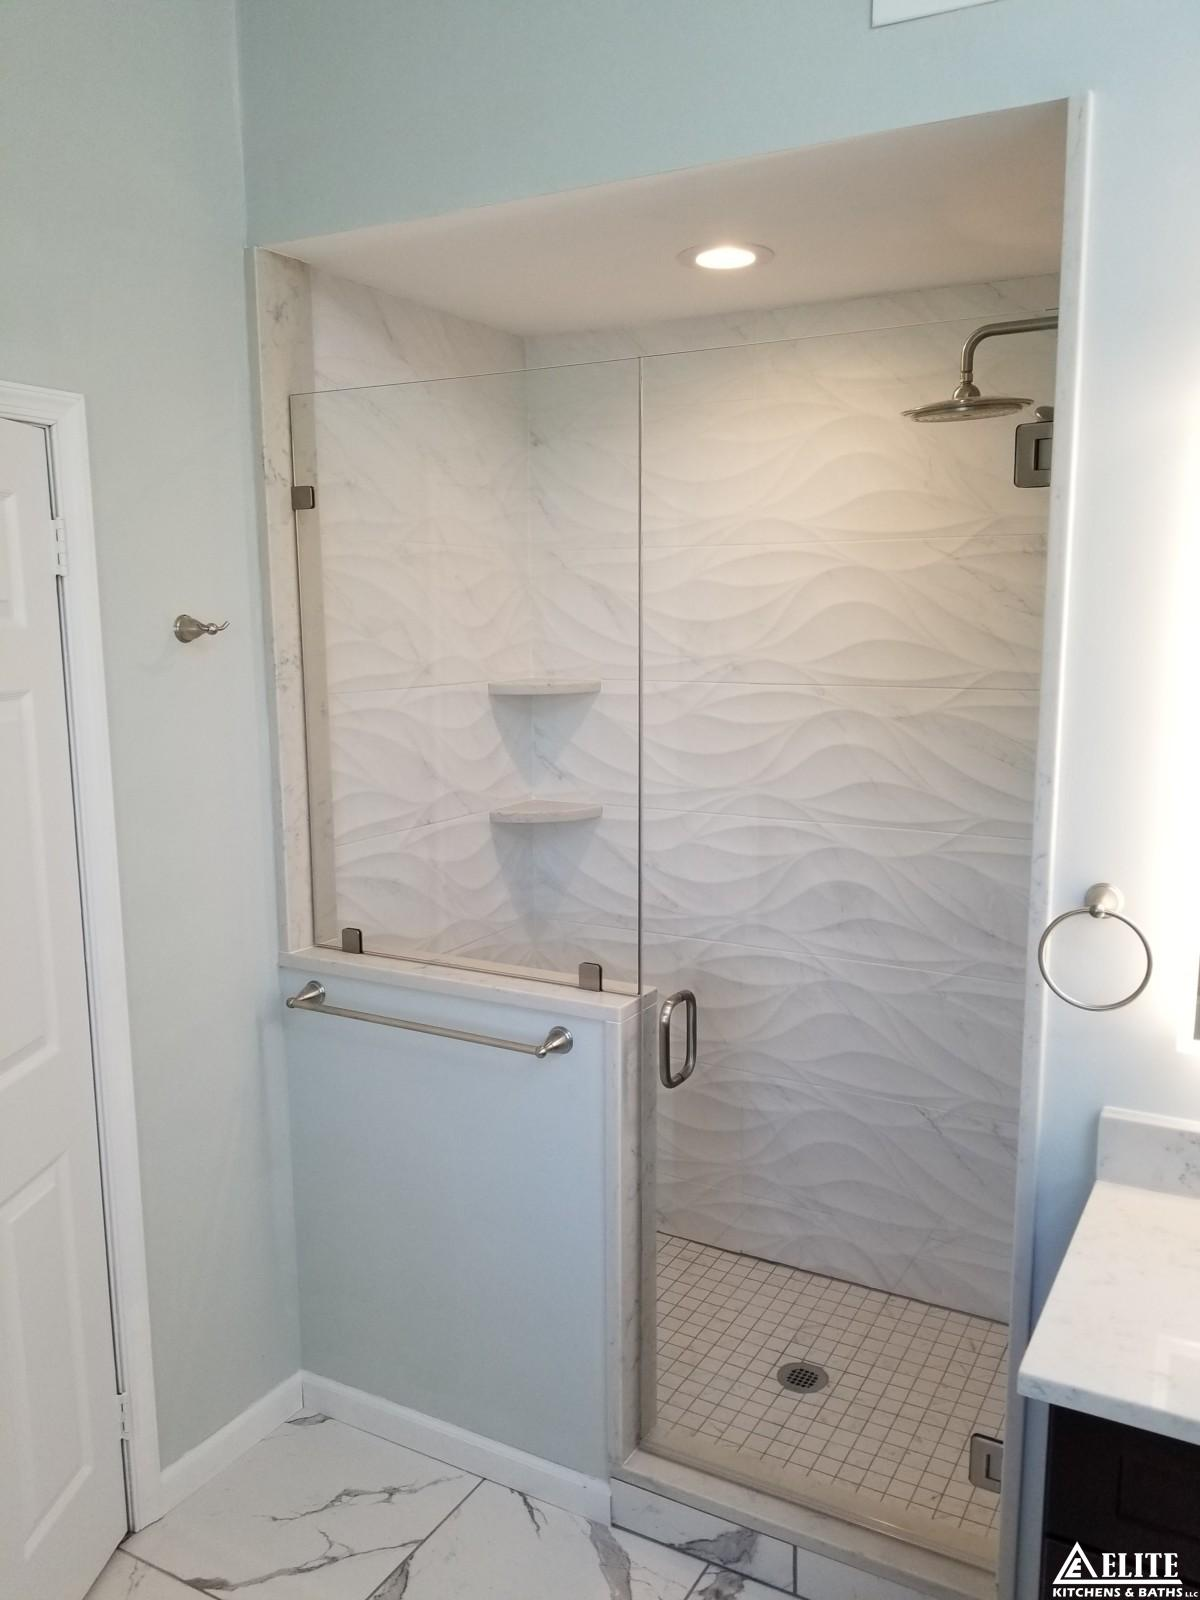 Bathrooms 83